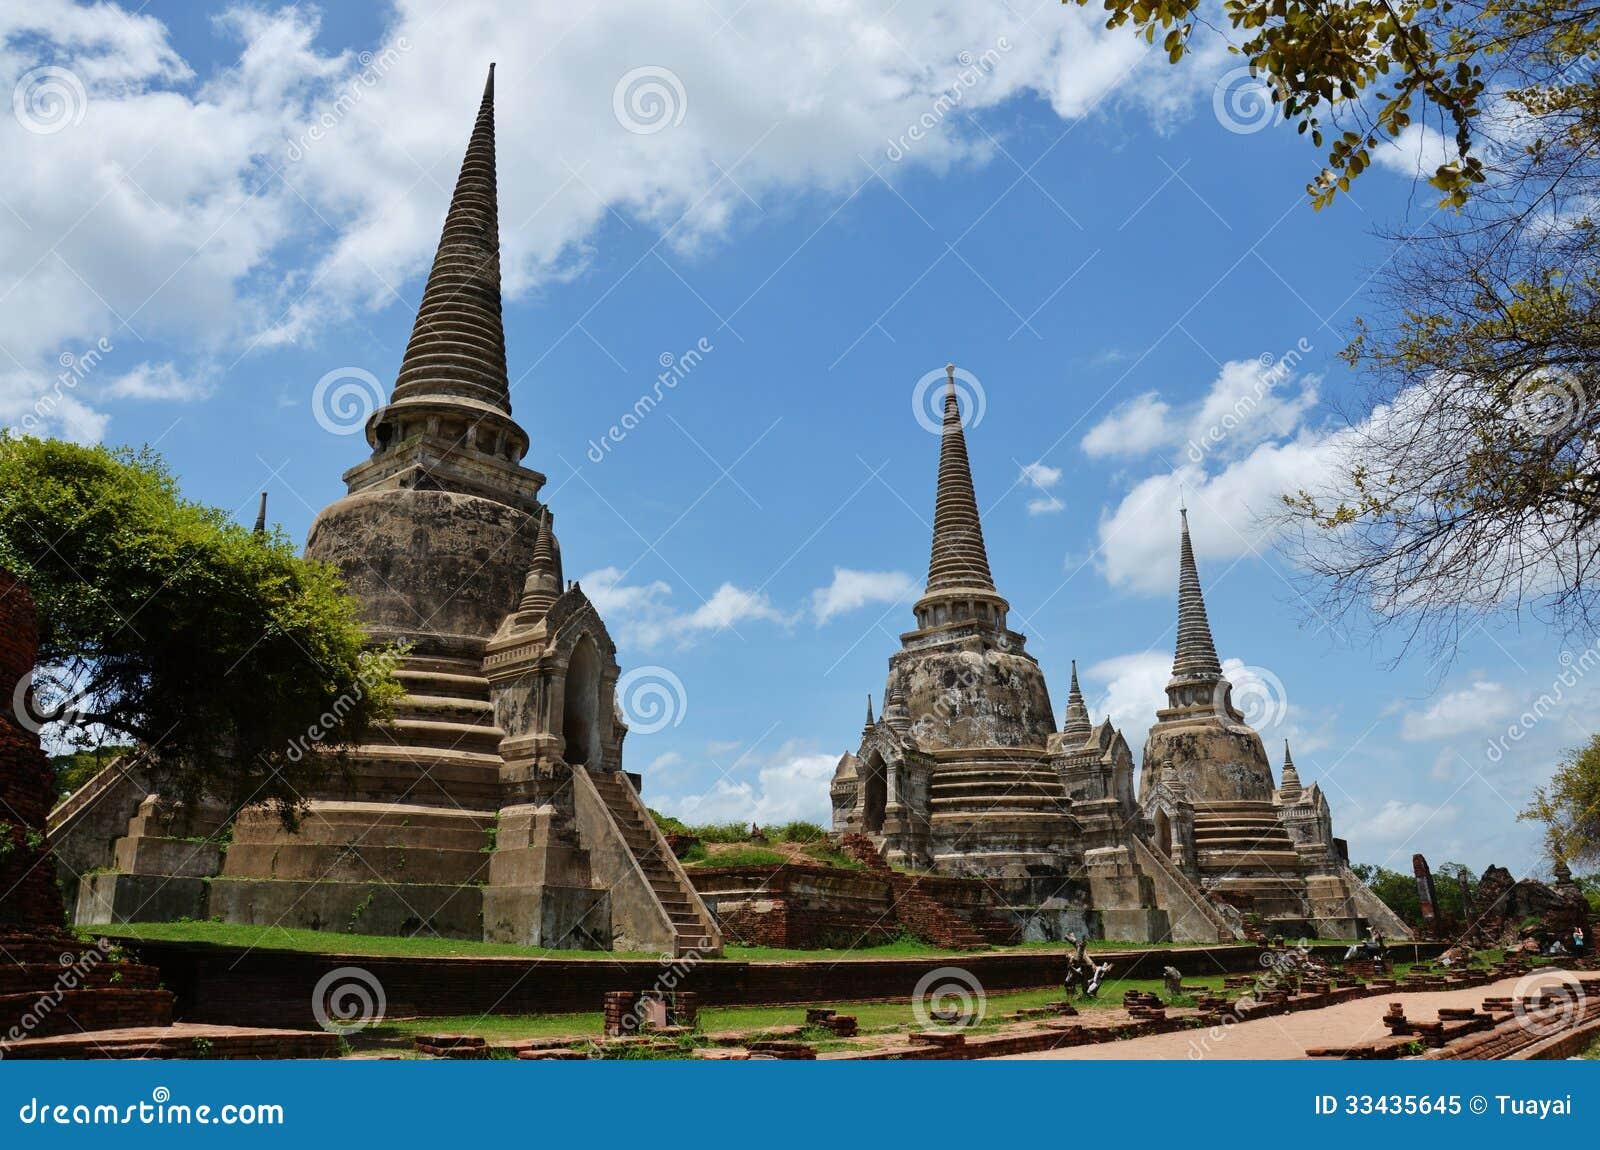 Wat Phra Sri Sanphet At Ayutthaya Historical Park Thailand Royalty Free Stock...